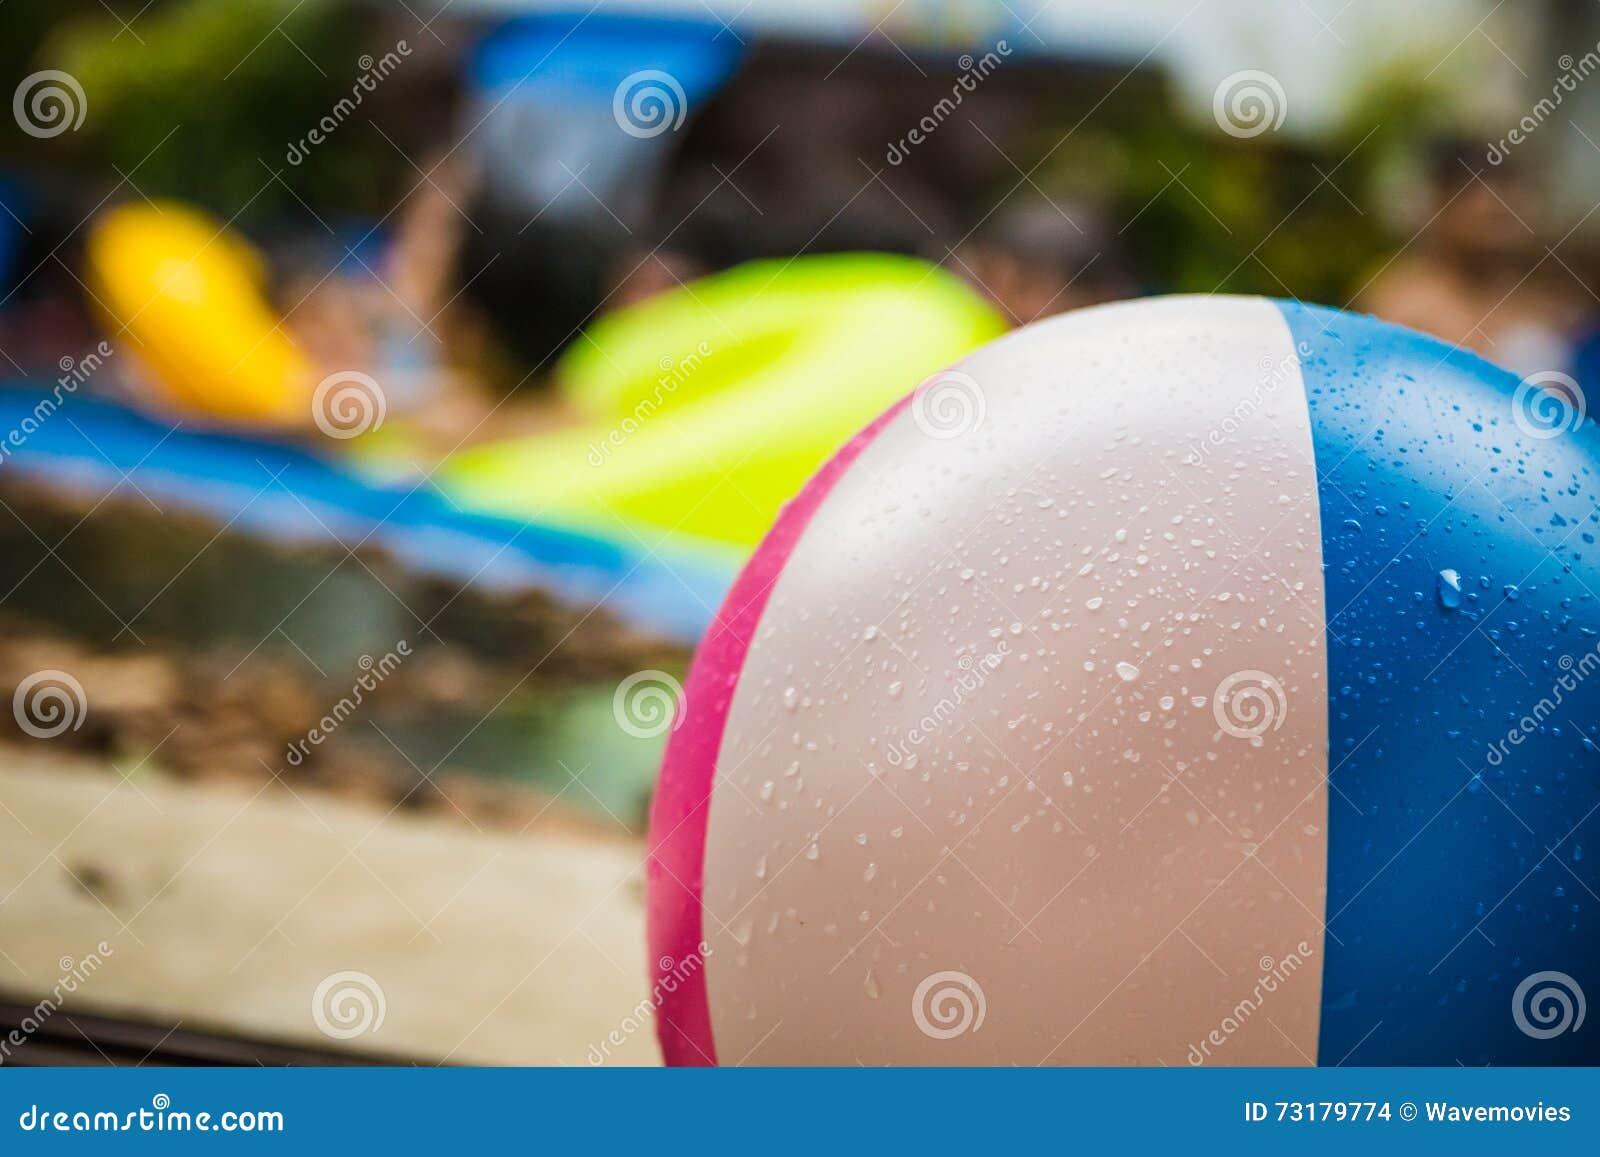 swimming pool beach ball background. Close Up On Colorful Wet Beach Ball In Swimming Pool Stock Photo - Image Of Beachball, Kids: 73179774 Background